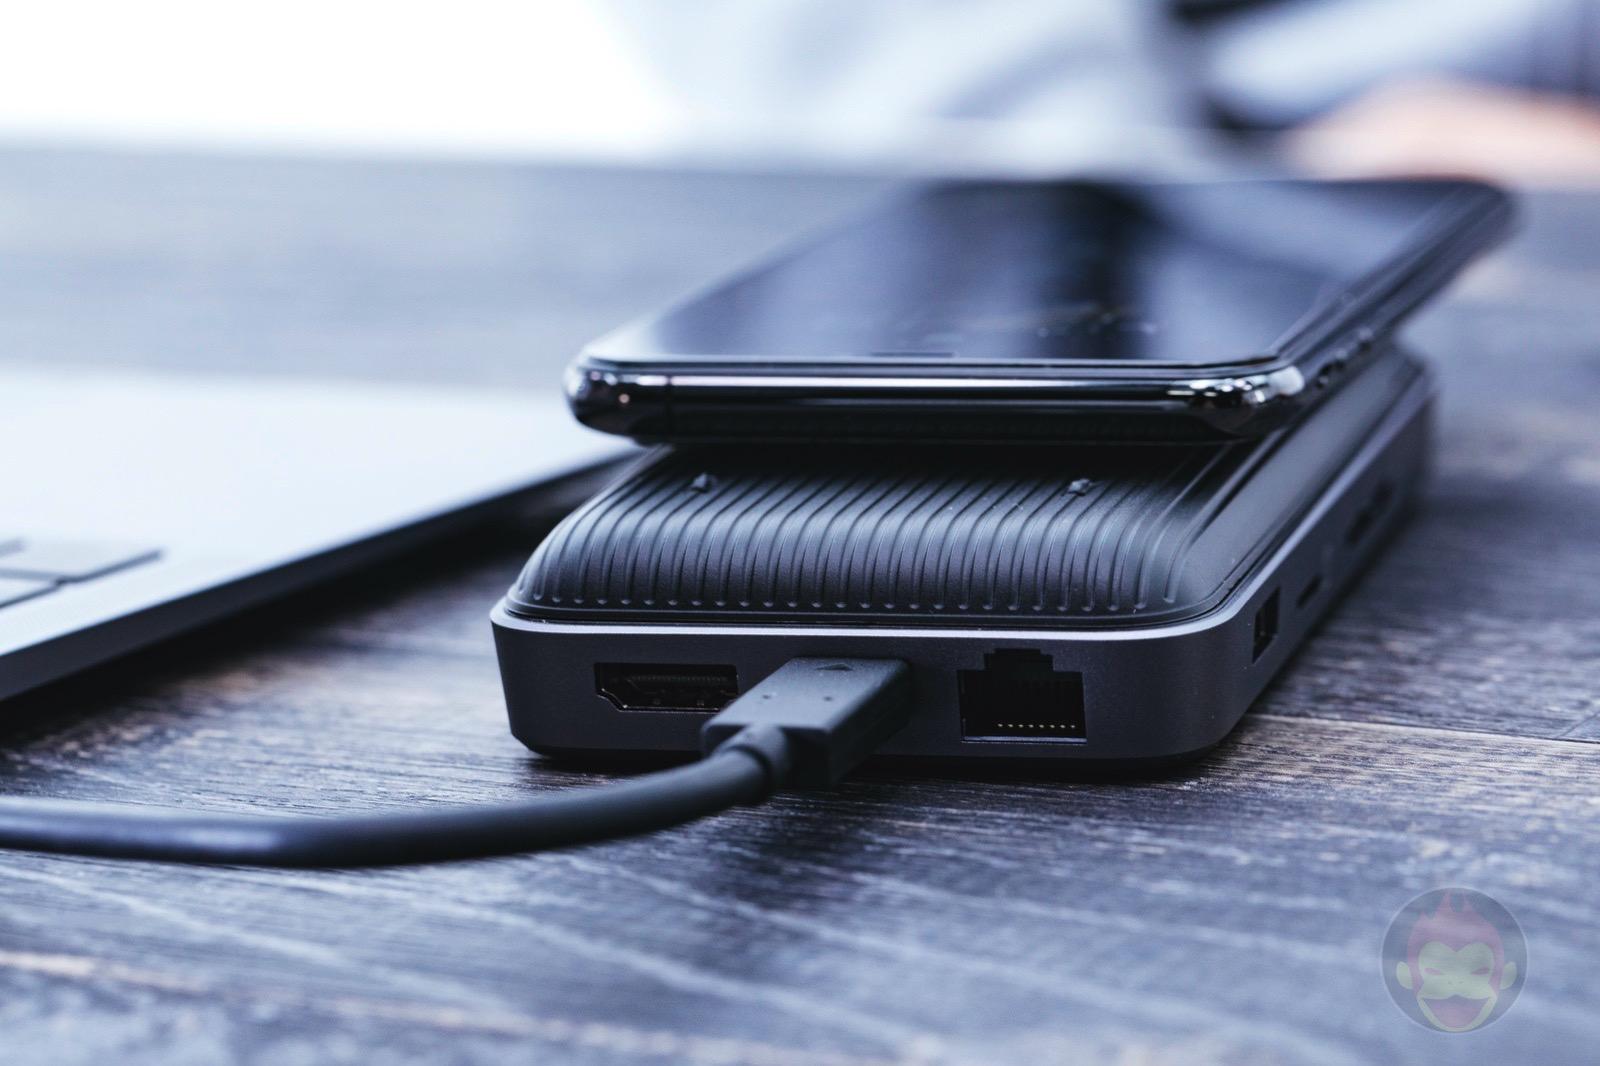 HyperDrive-Wireless-Charger-USBC-Hub-Review-12.jpg